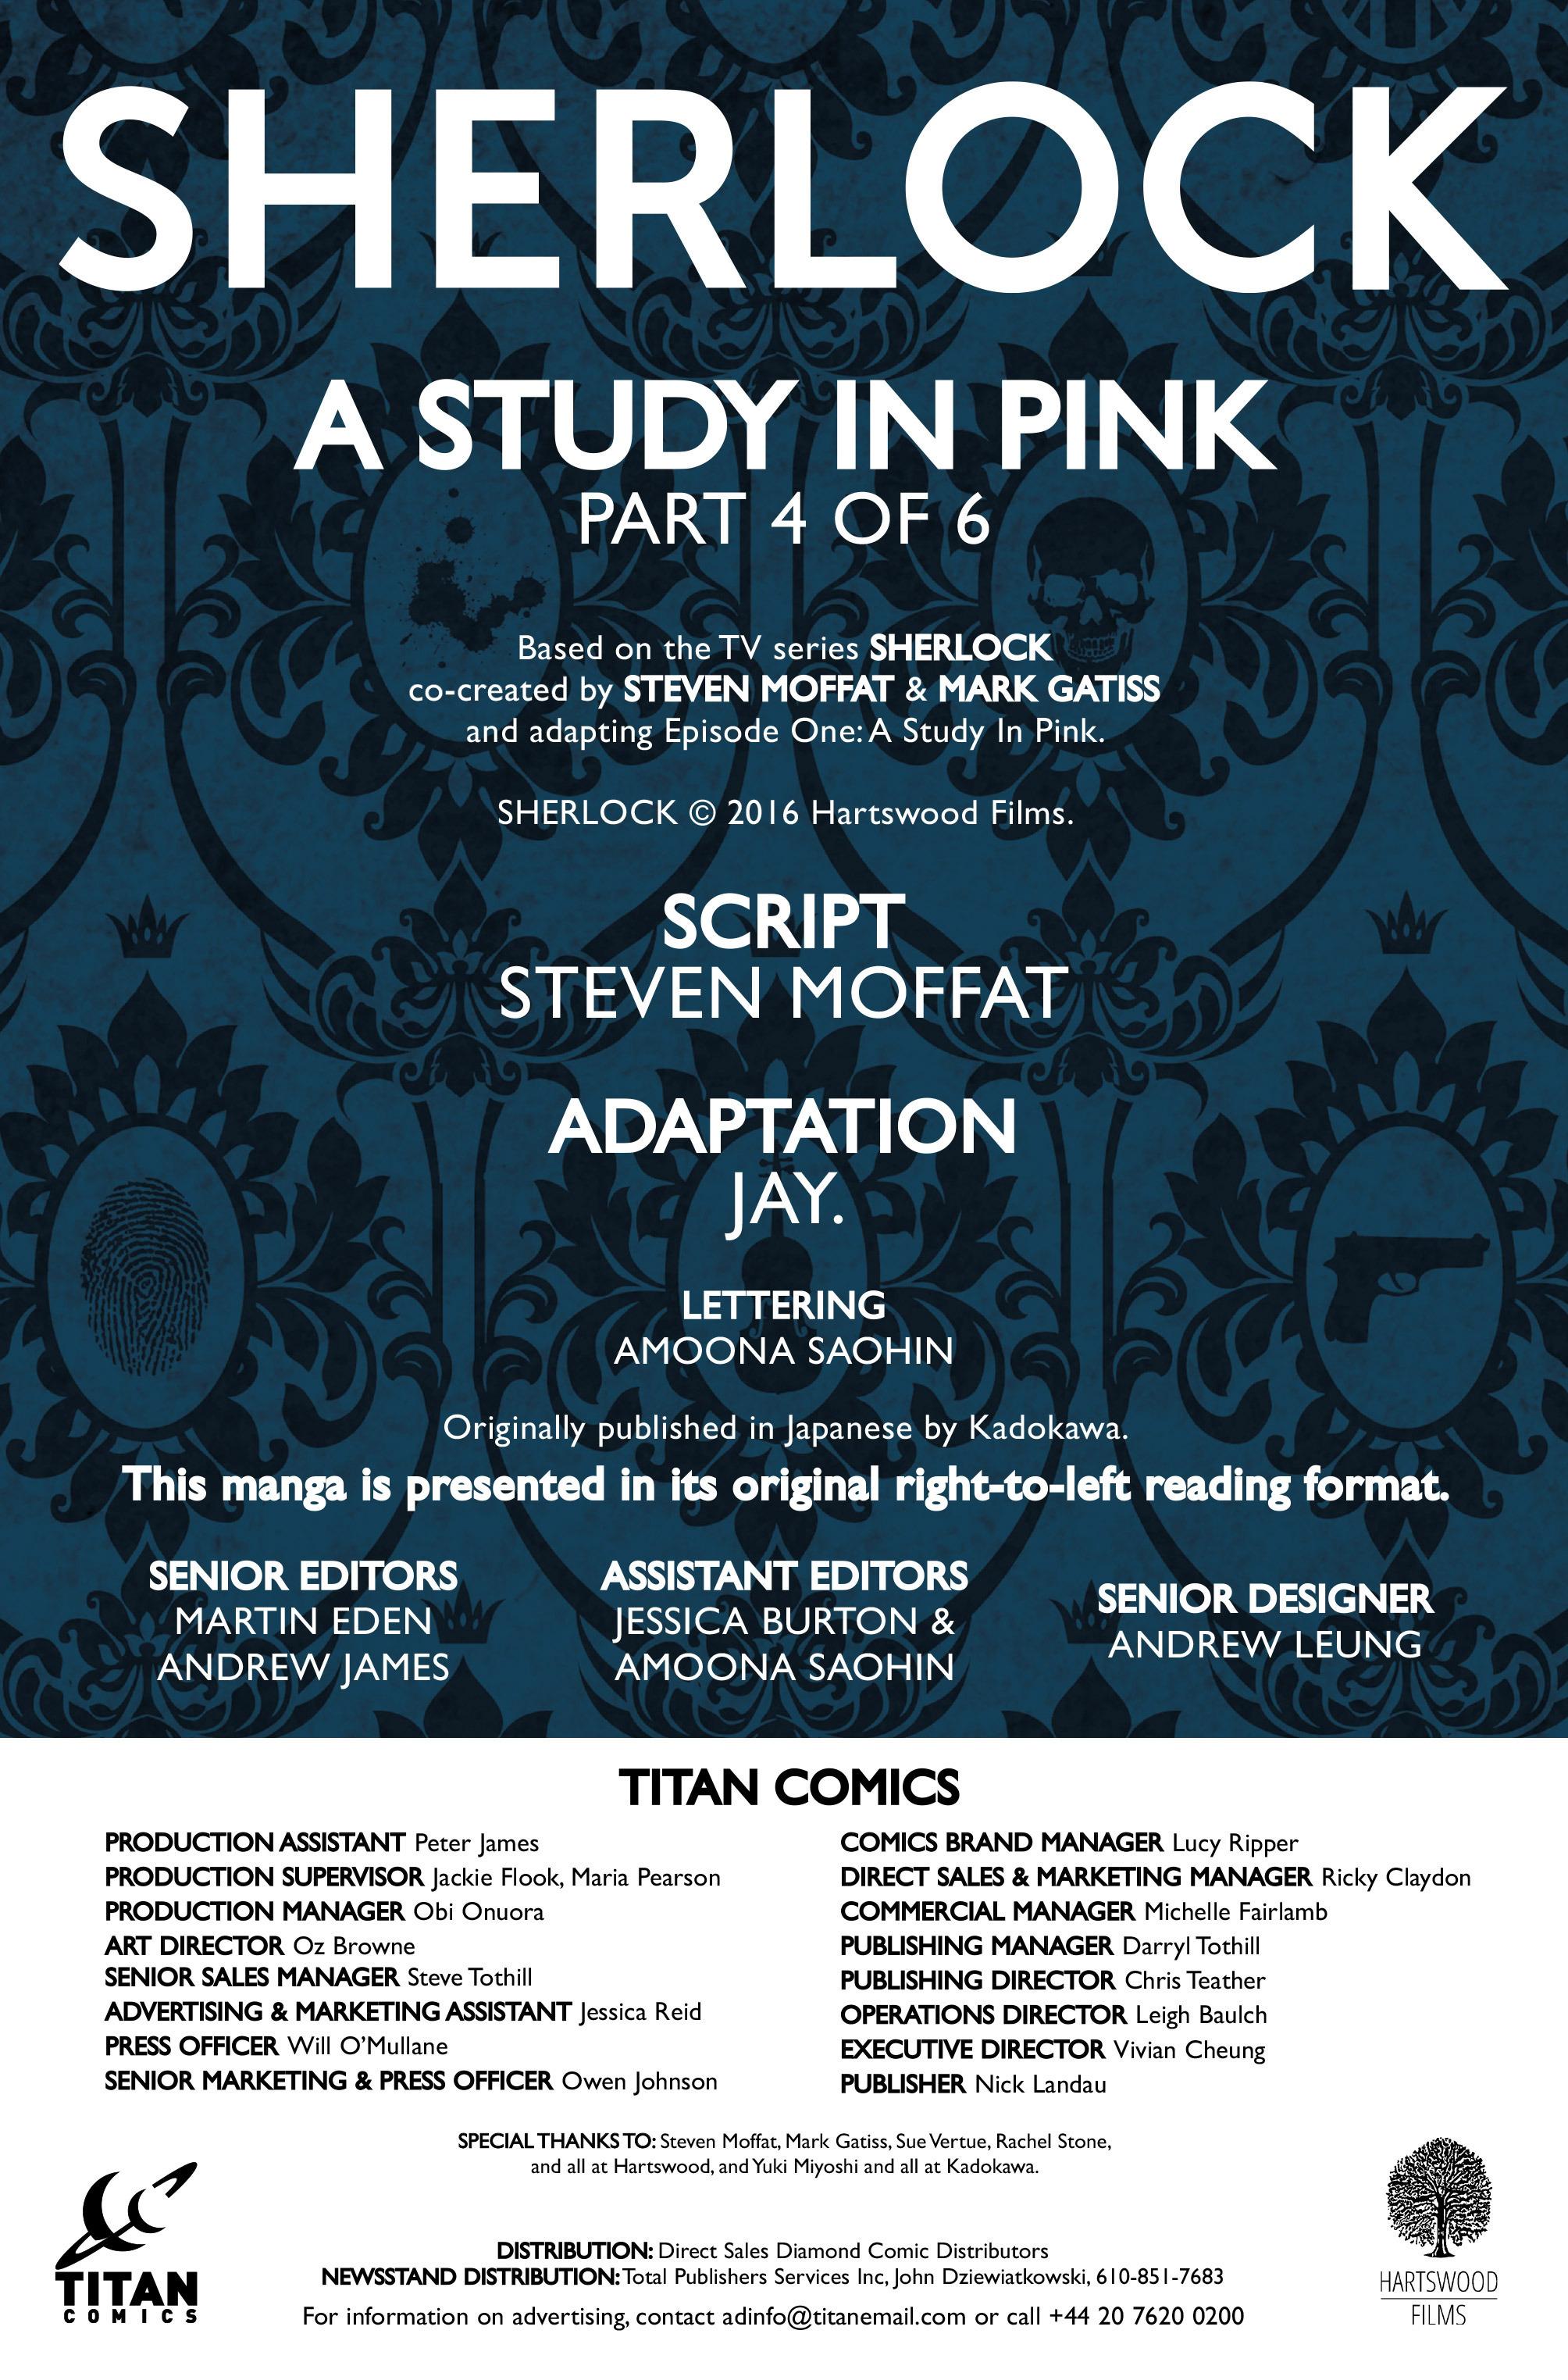 Read online Sherlock: A Study In Pink comic -  Issue #4 - 4